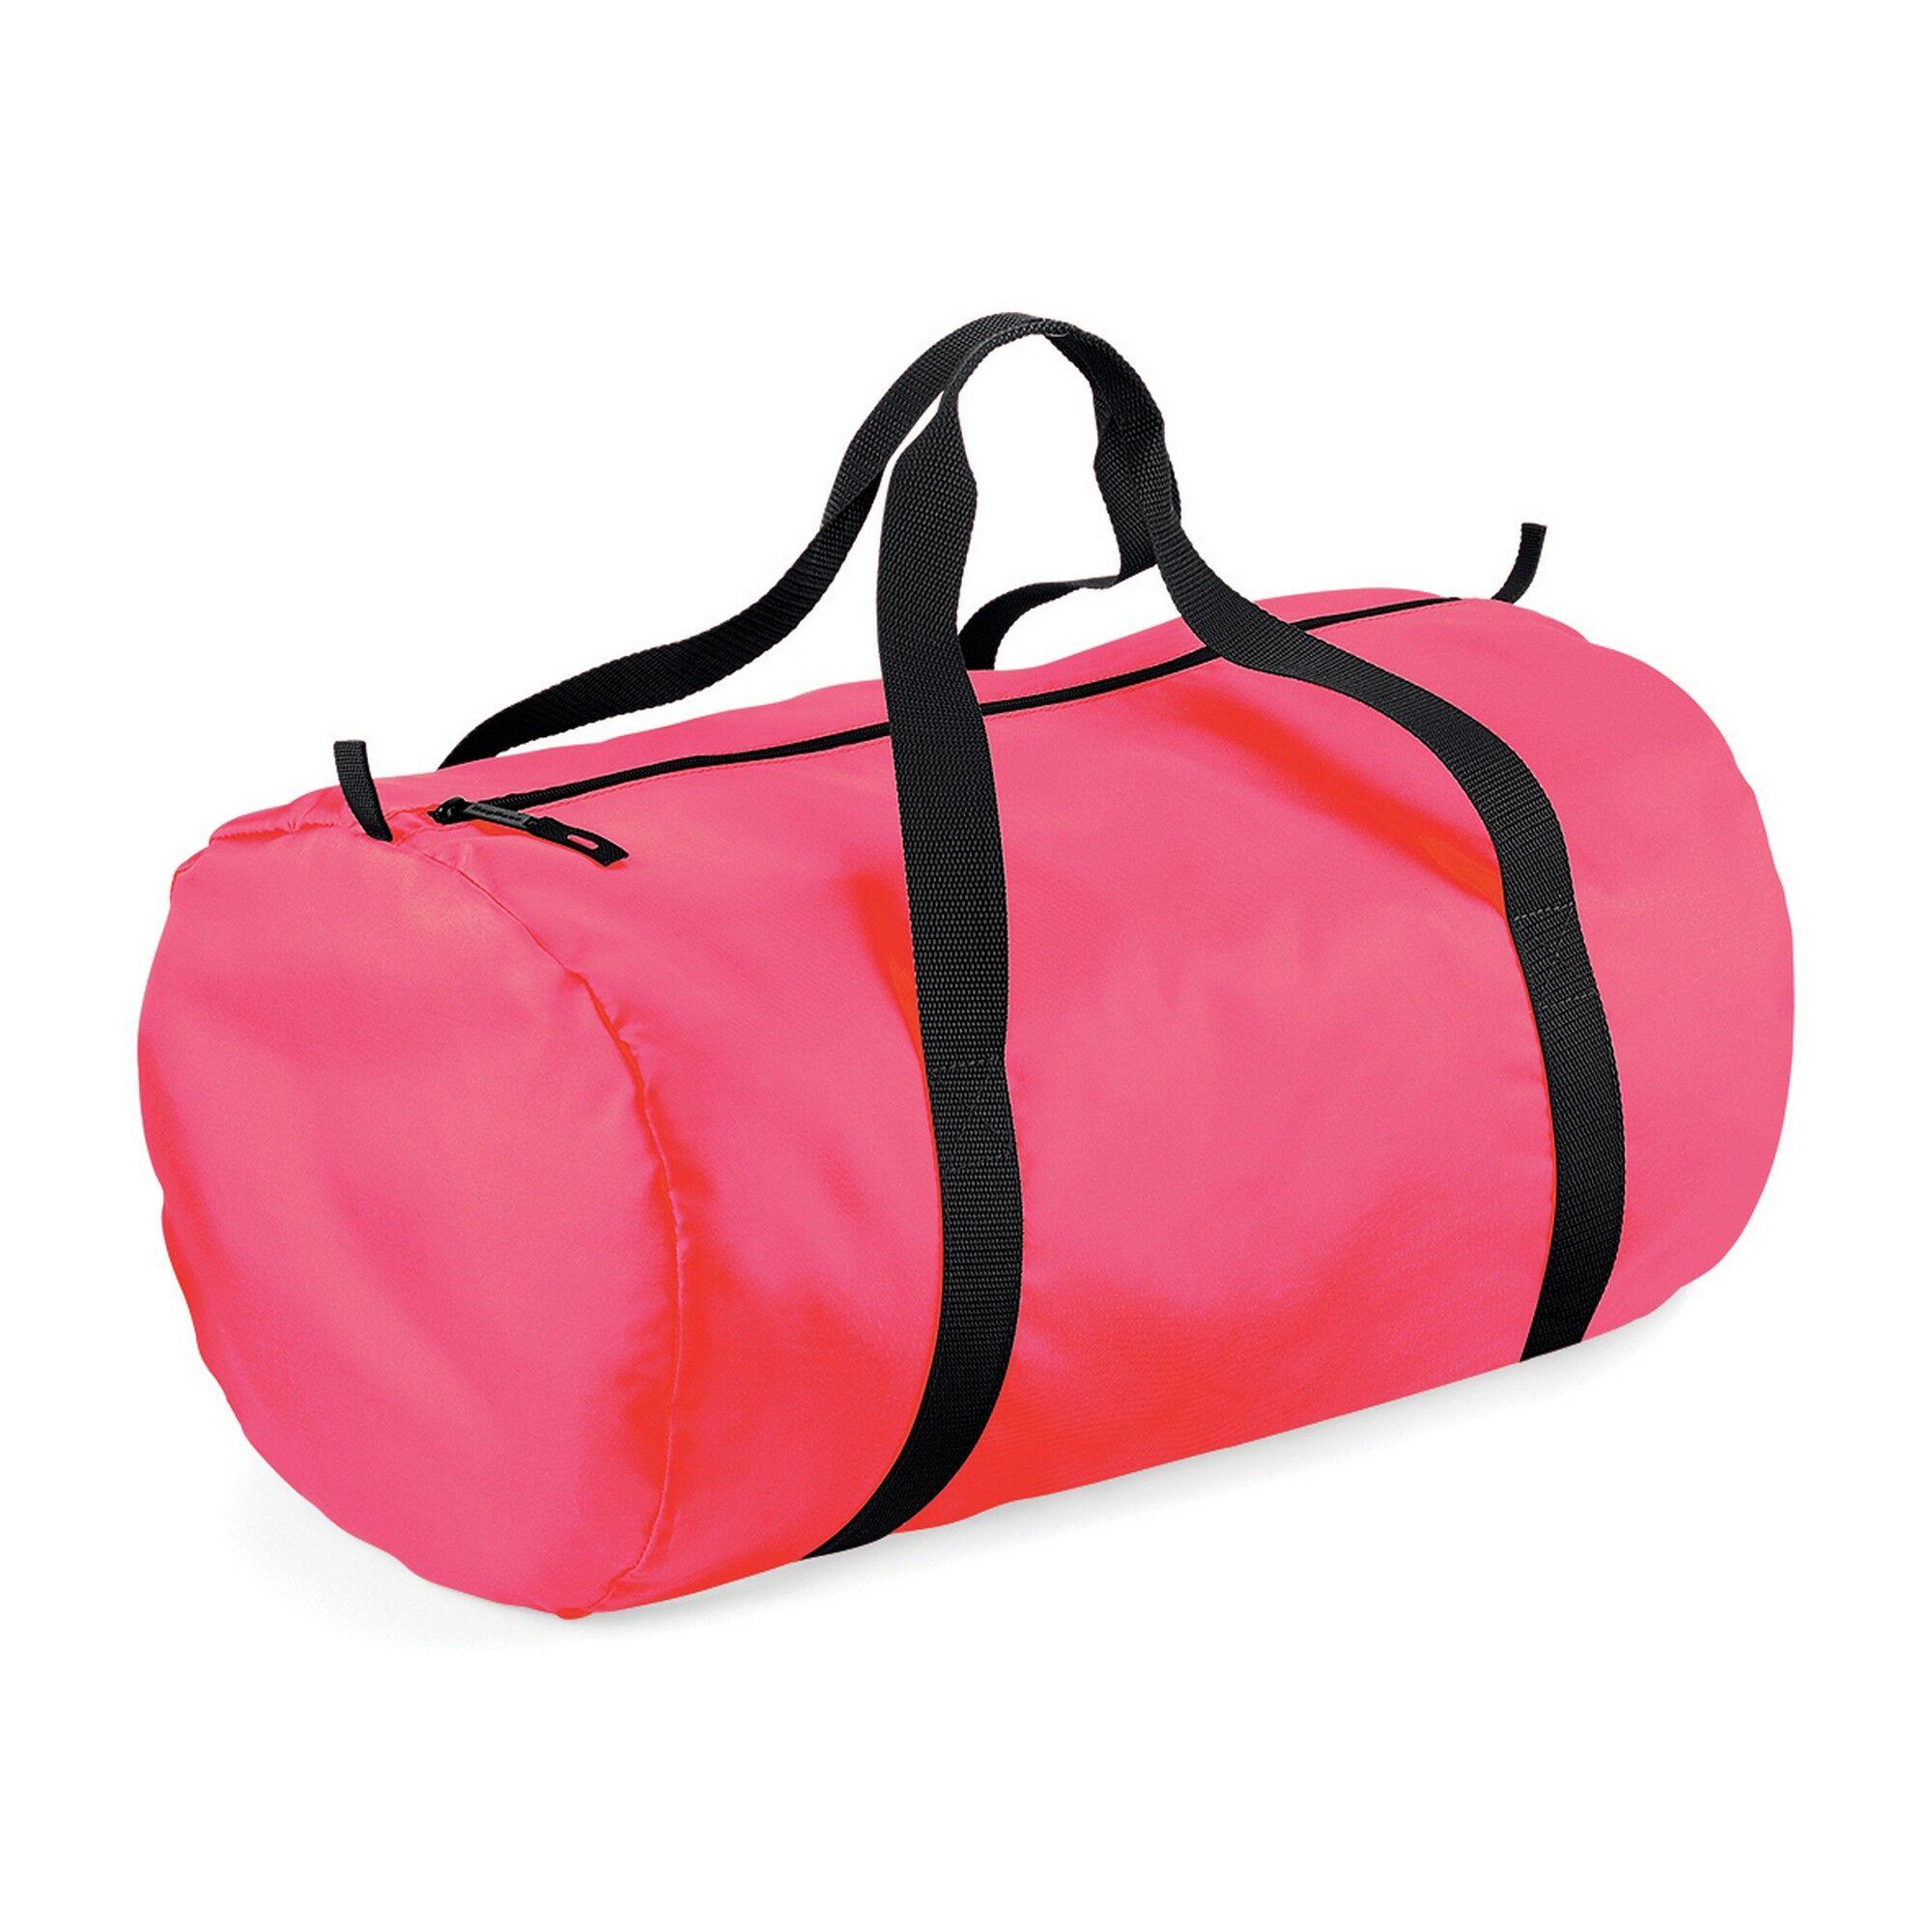 Bagbase Packaway - Sac De Voyage (32 Litres) (Lot De 2) (Rose fluo/Noir) - UTRW6915